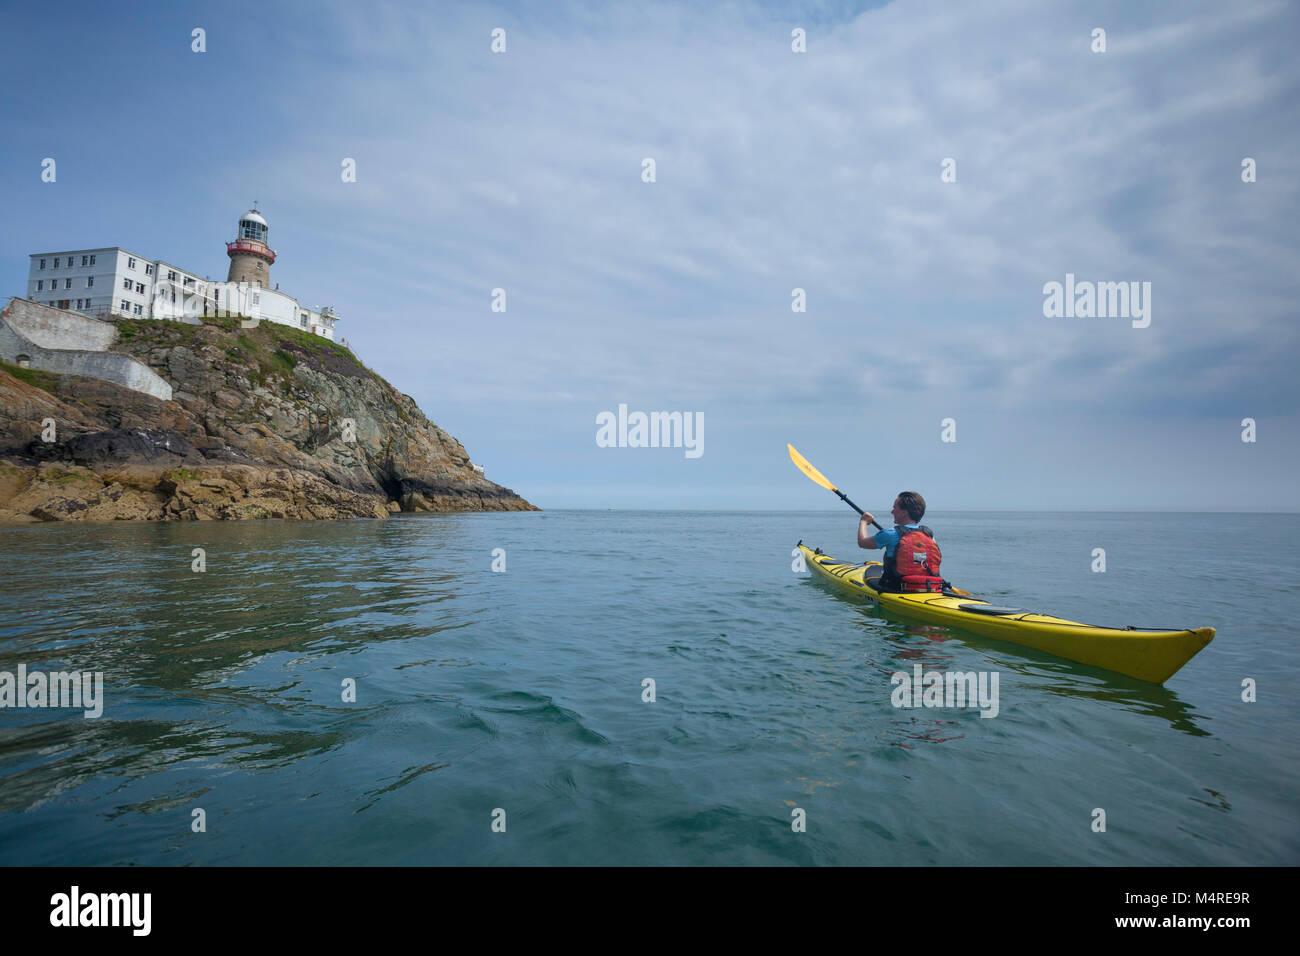 Sea kayaker beneath Baily Lighthouse, Howth Head, County Dublin, Ireland. - Stock Image